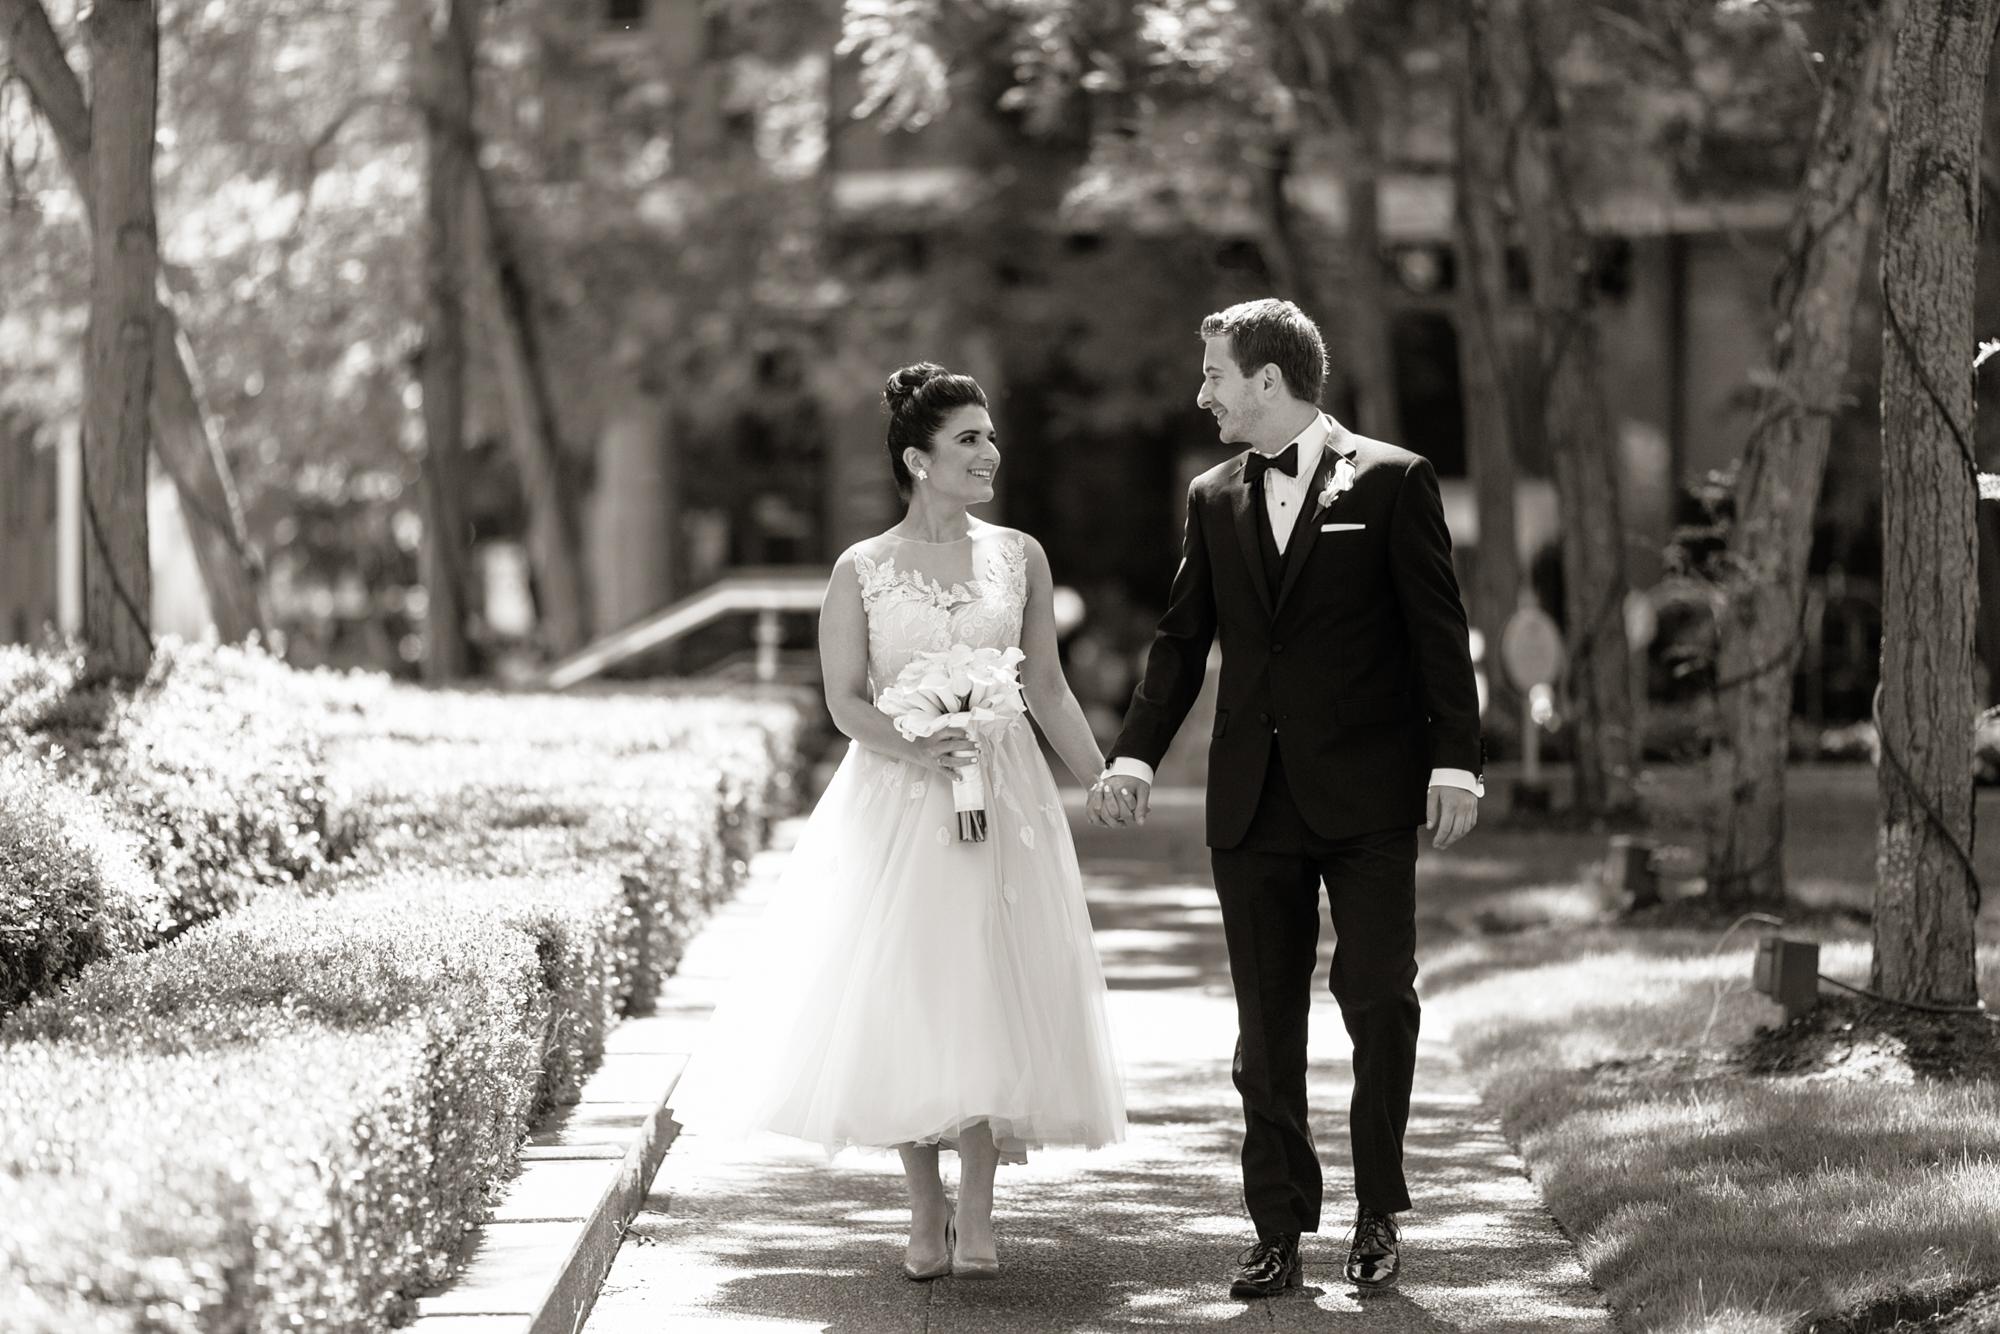 vancouver-luxury-wedding-photographer-lori-miles-052.jpg